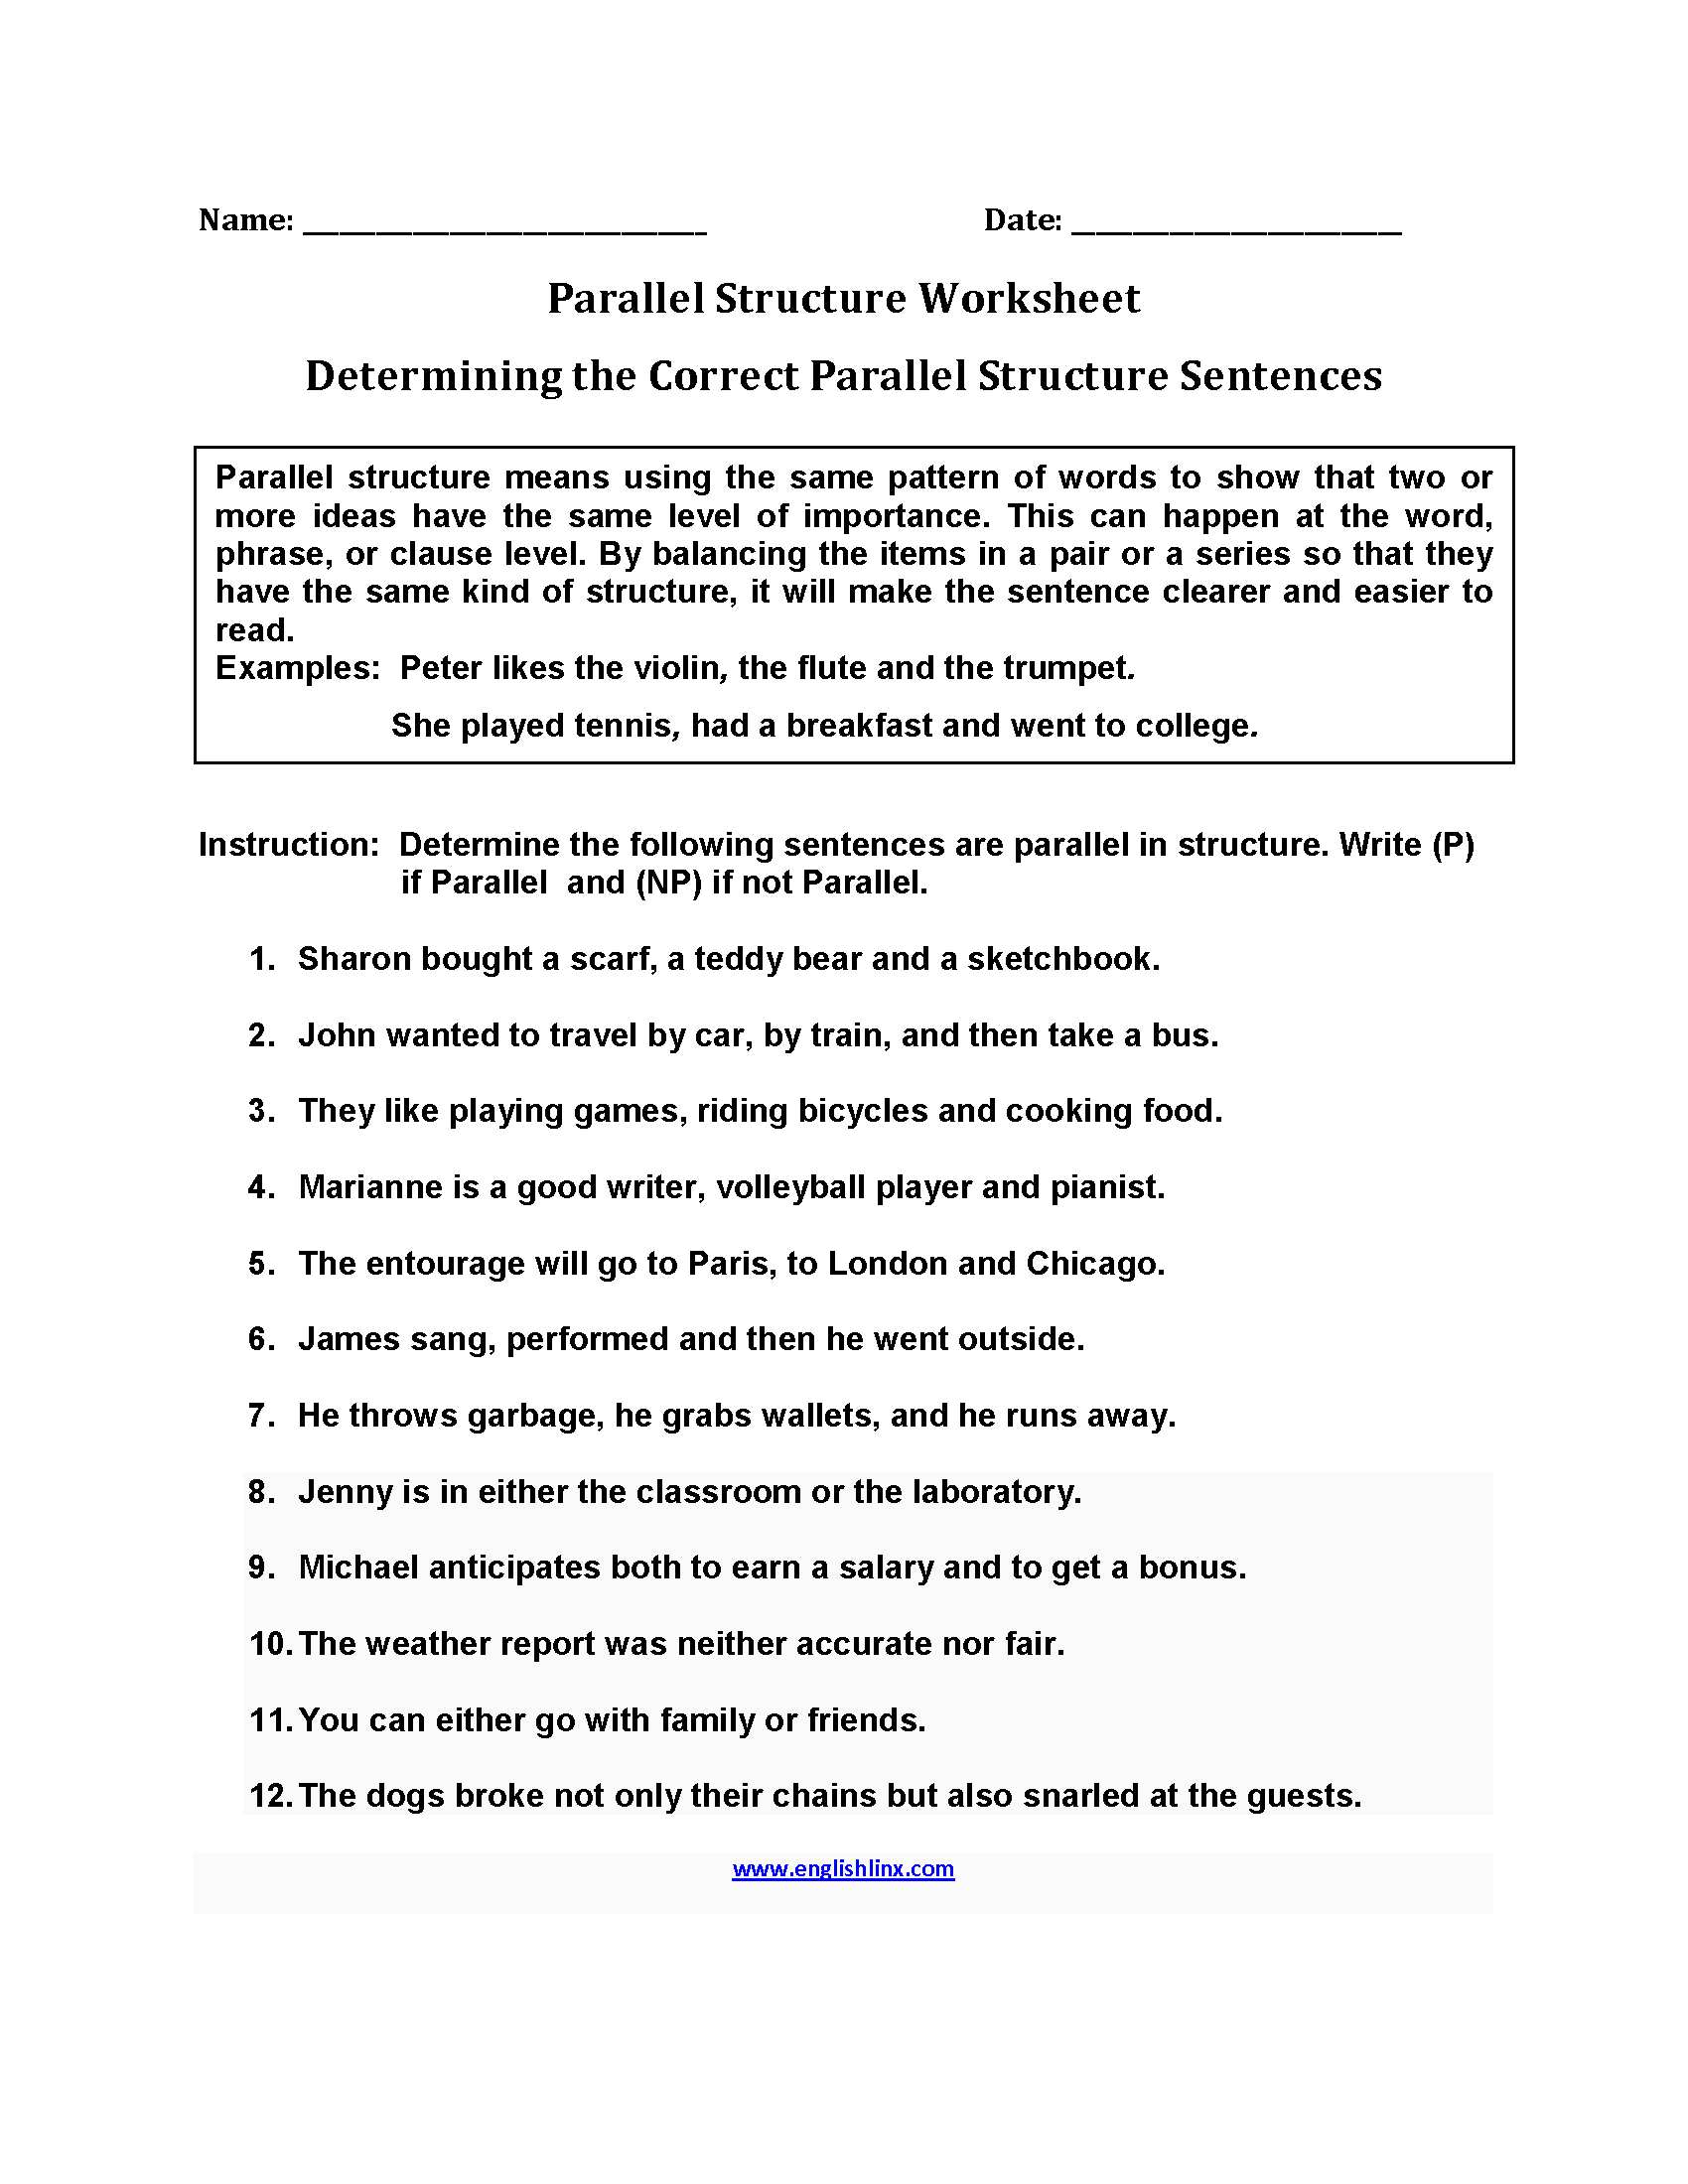 Worksheets Text Structure Worksheets 5th Grade determining parallel structure worksheets englishlinx com board worksheets